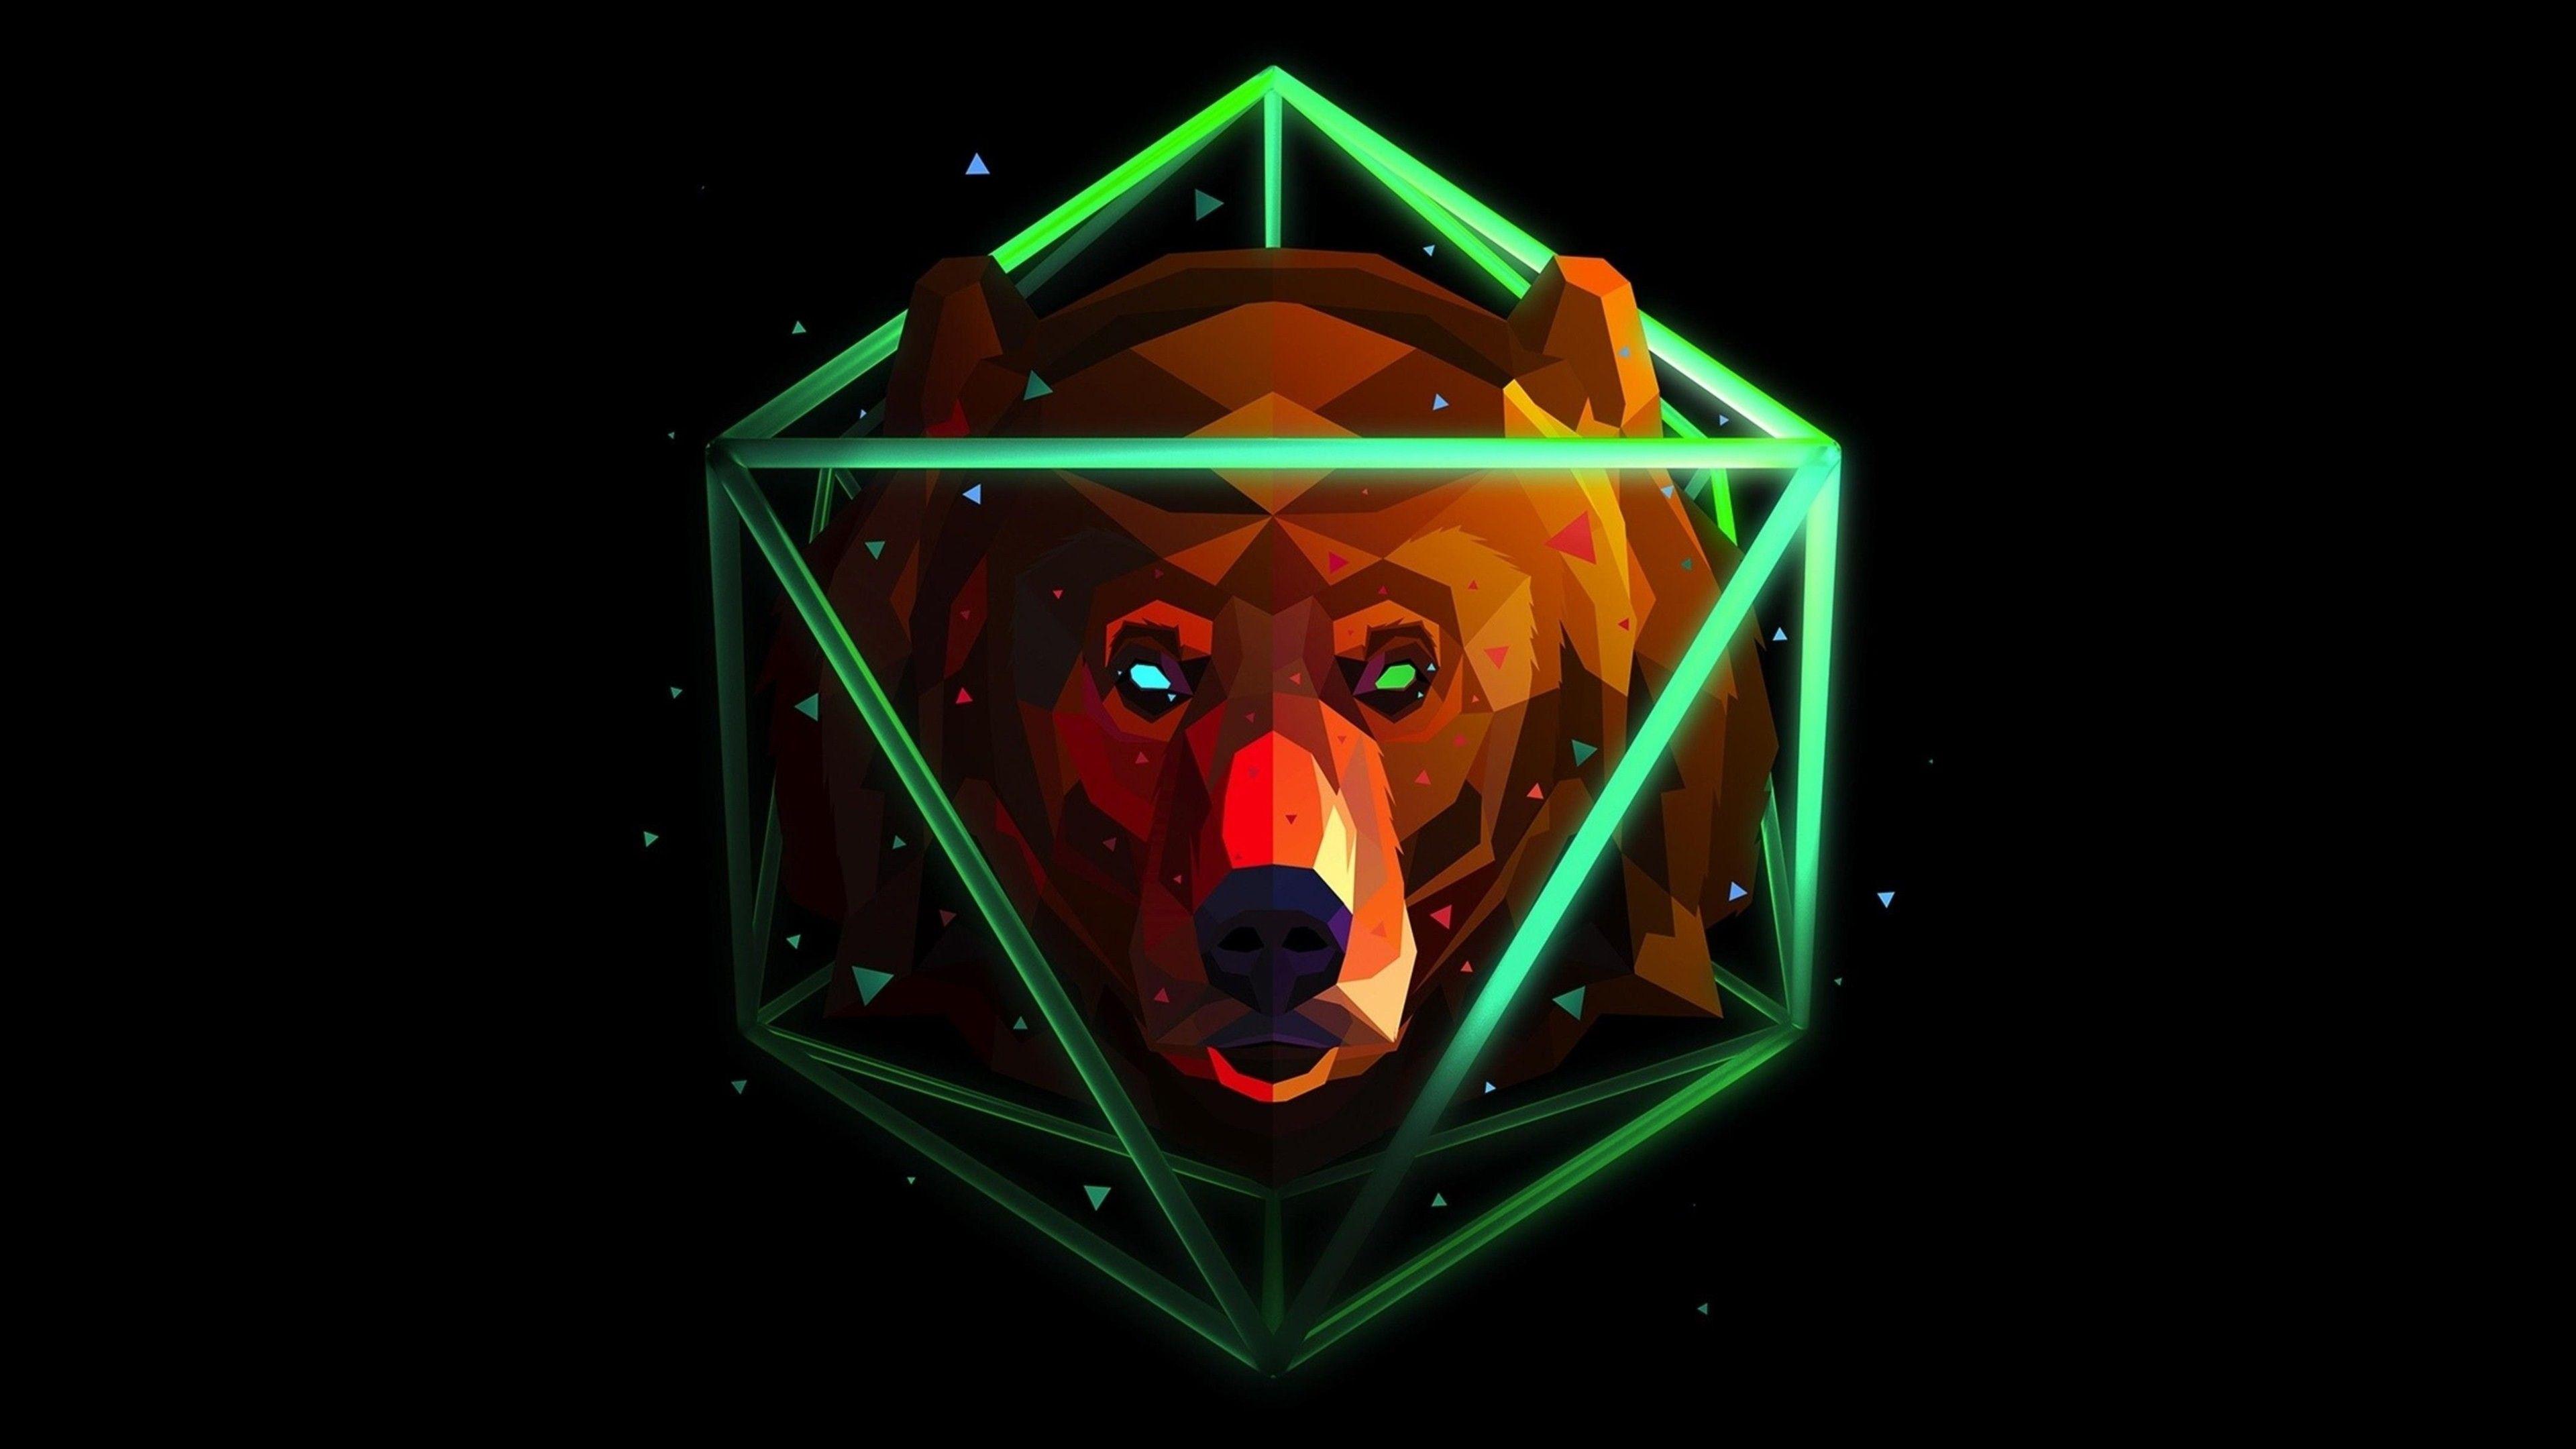 bear desktop backgrounds hd